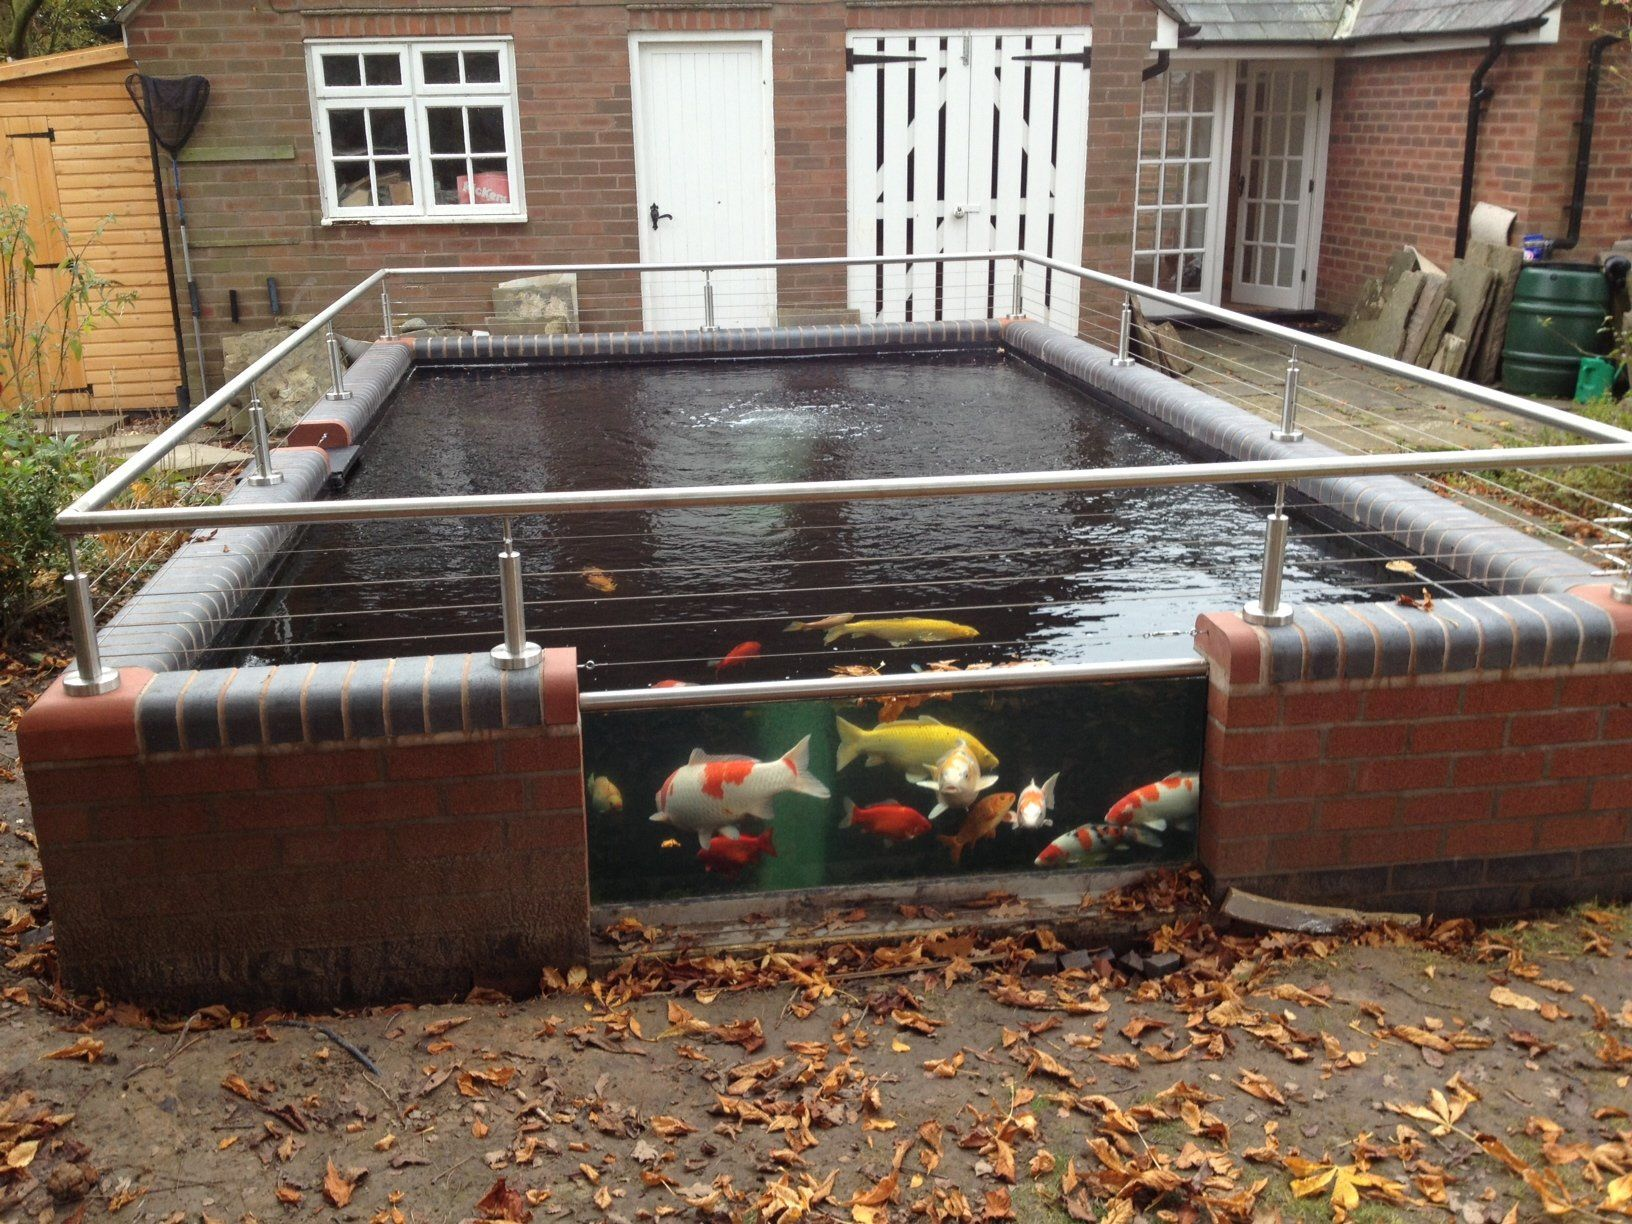 Michael h knutsford quality nishikigoi koi pond for Small koi ponds for sale